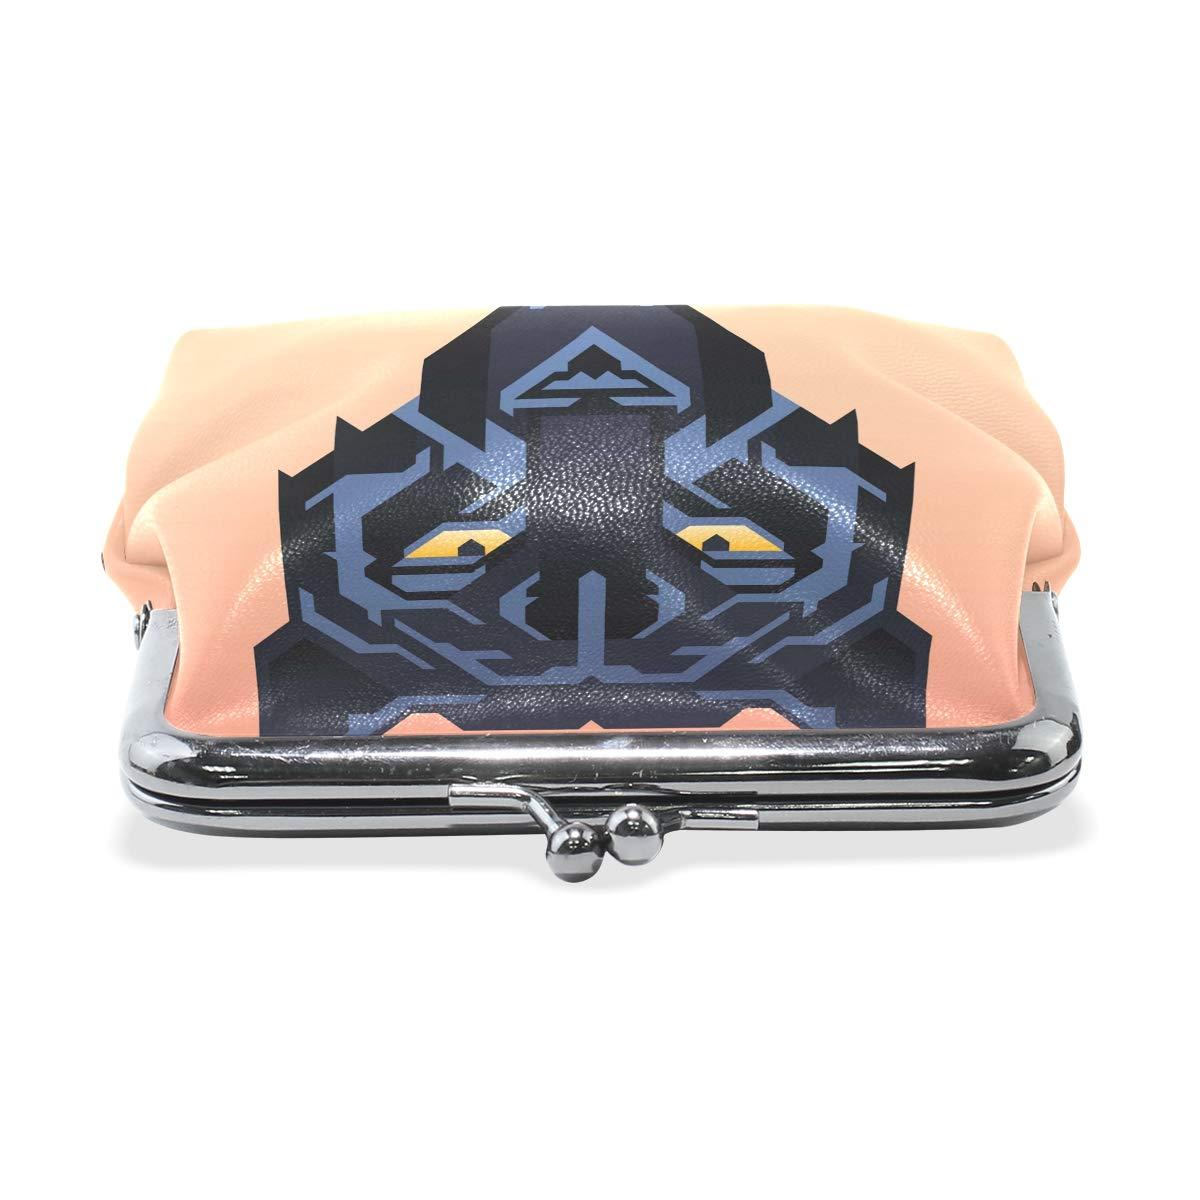 LALATOP Black Panther Mascot Womens Coin Pouch Purse wallet Card Holder Clutch Handbag